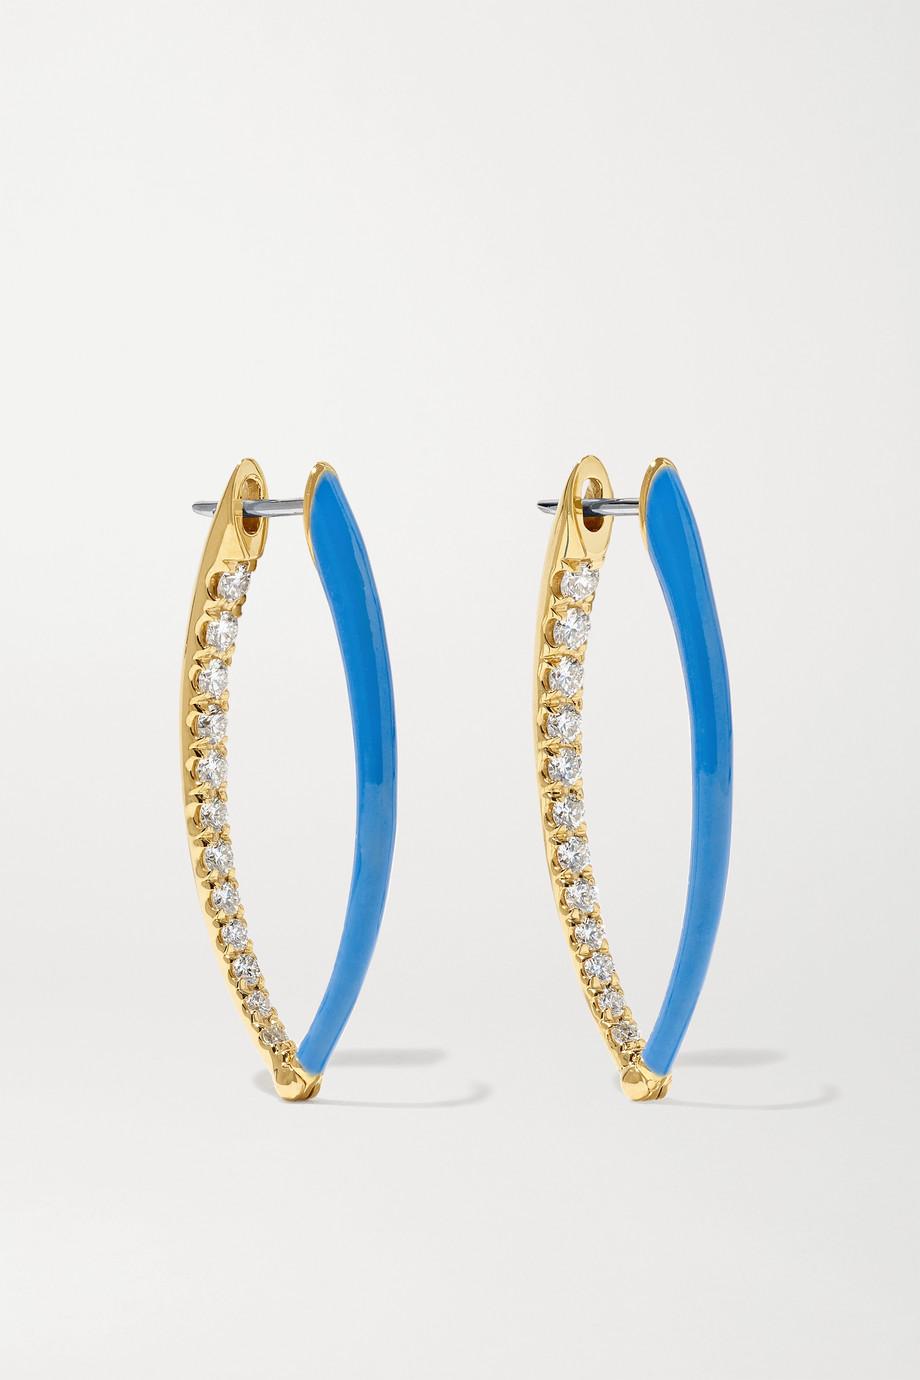 Melissa Kaye Cristina medium 18-karat gold, diamond and enamel earrings